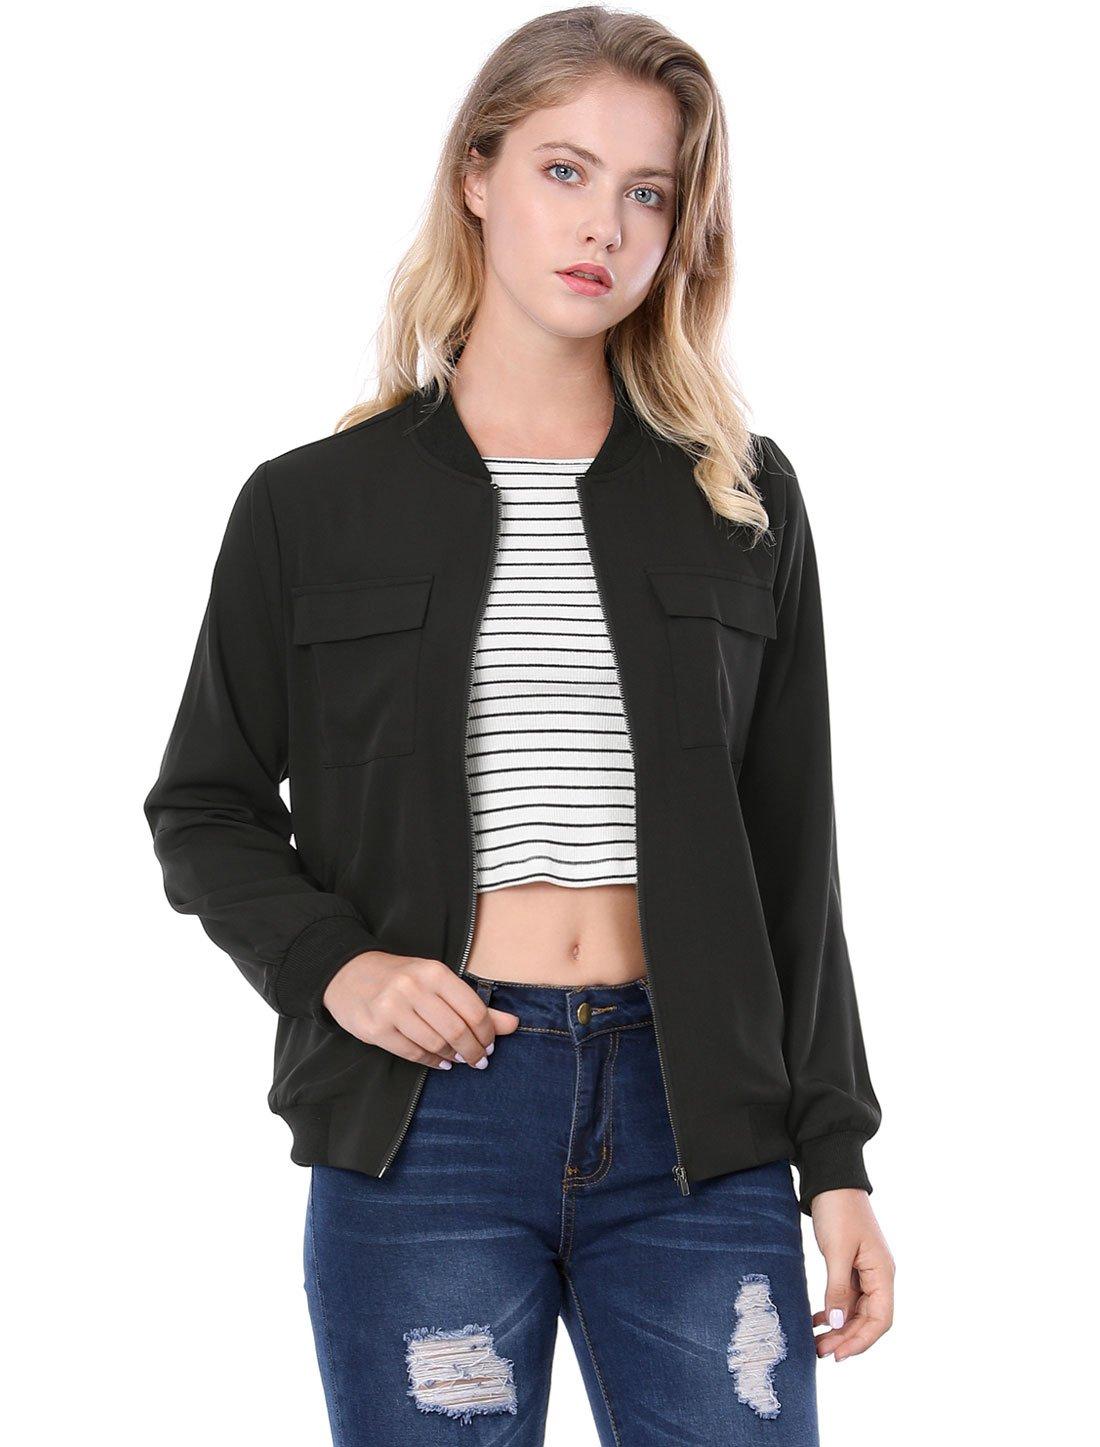 Allegra K Women's Multi-Pocket Zip Fastening Lightweight Bomber Jacket S Black